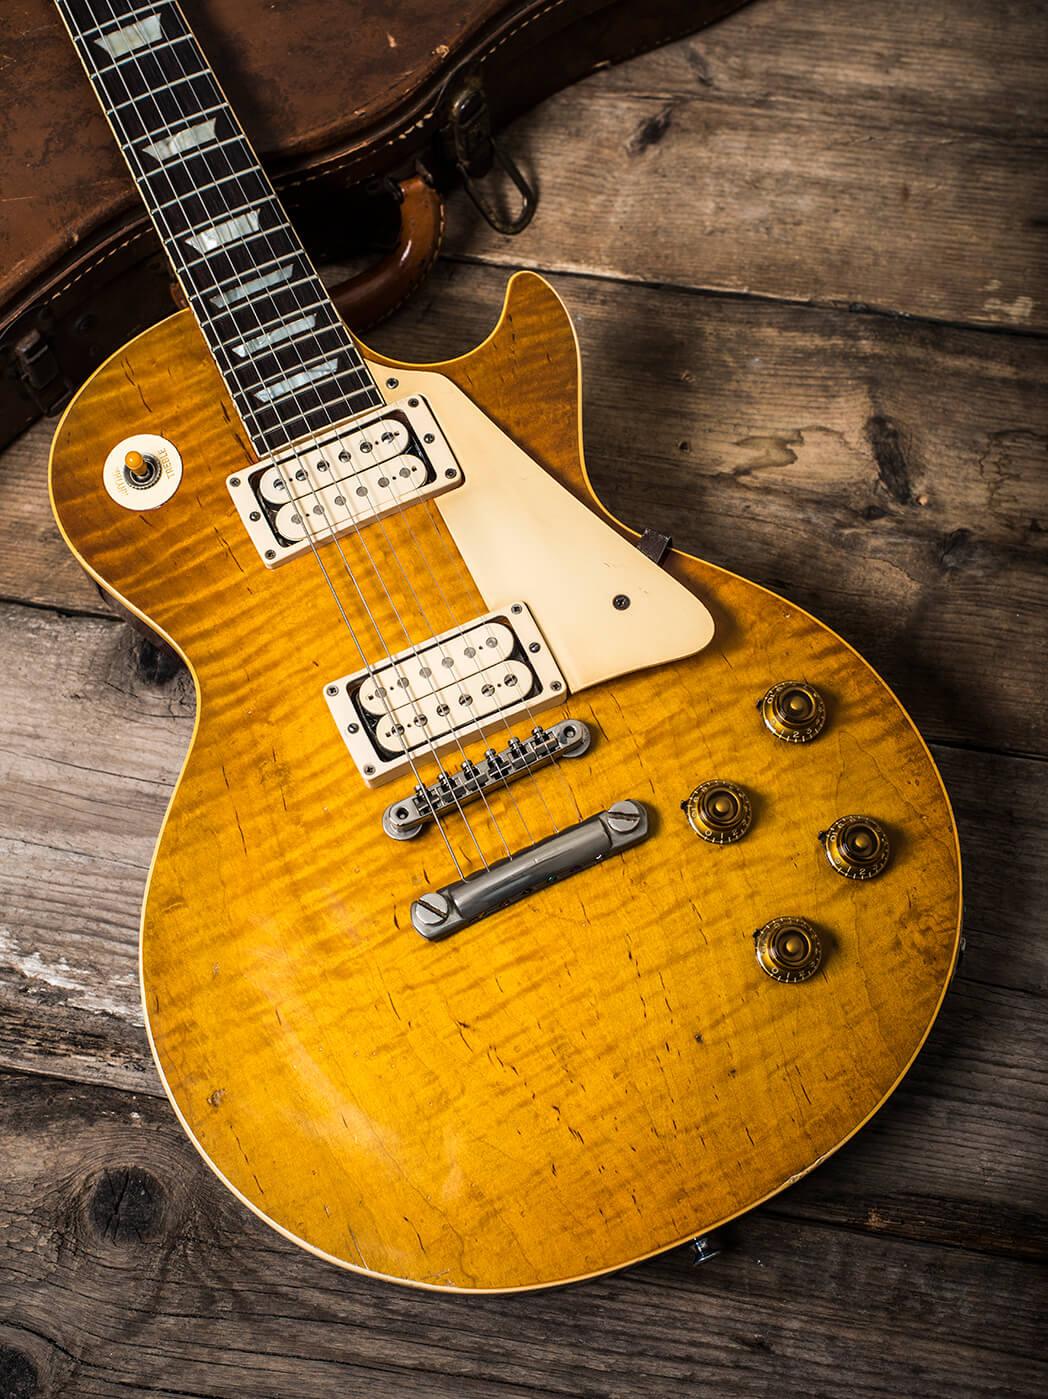 Gary Richrath 1959 Gibson Les Paul top shot portrait wooden floor